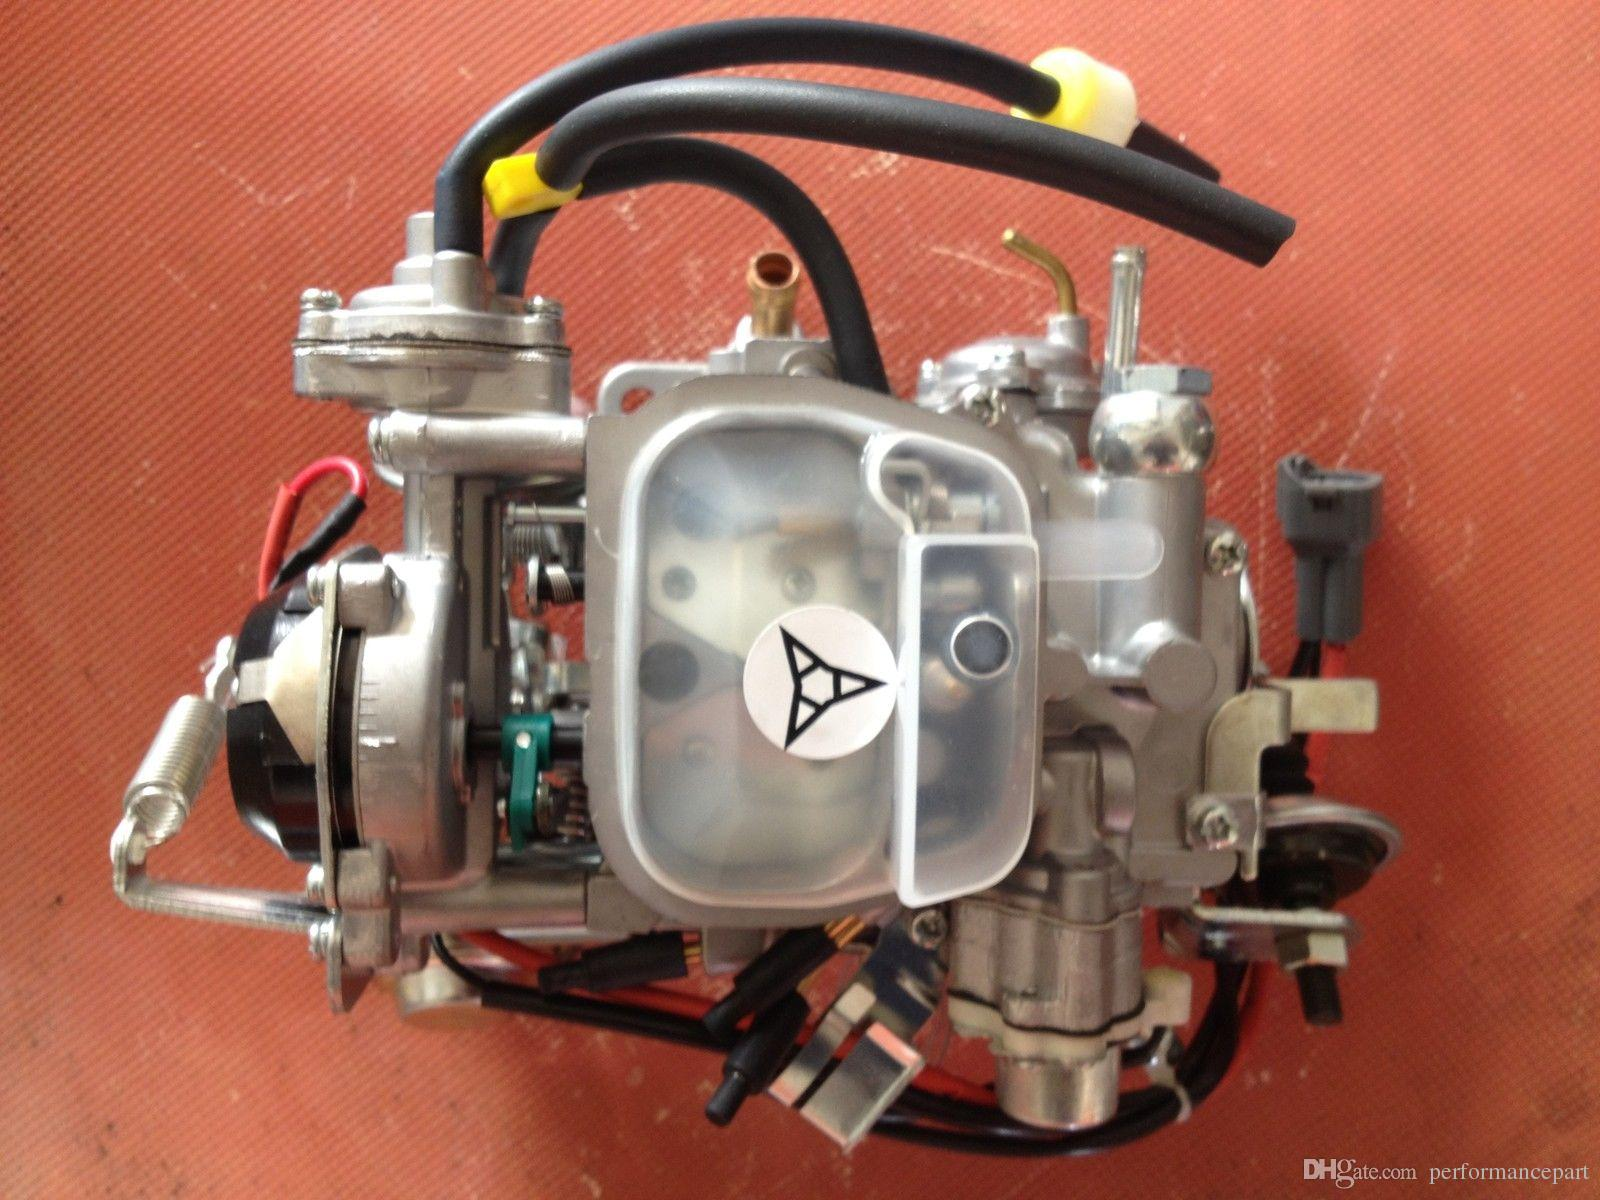 CARB new REPLACE CARBURETOR 22R toyota engine corona 21100-35520 22R toyota